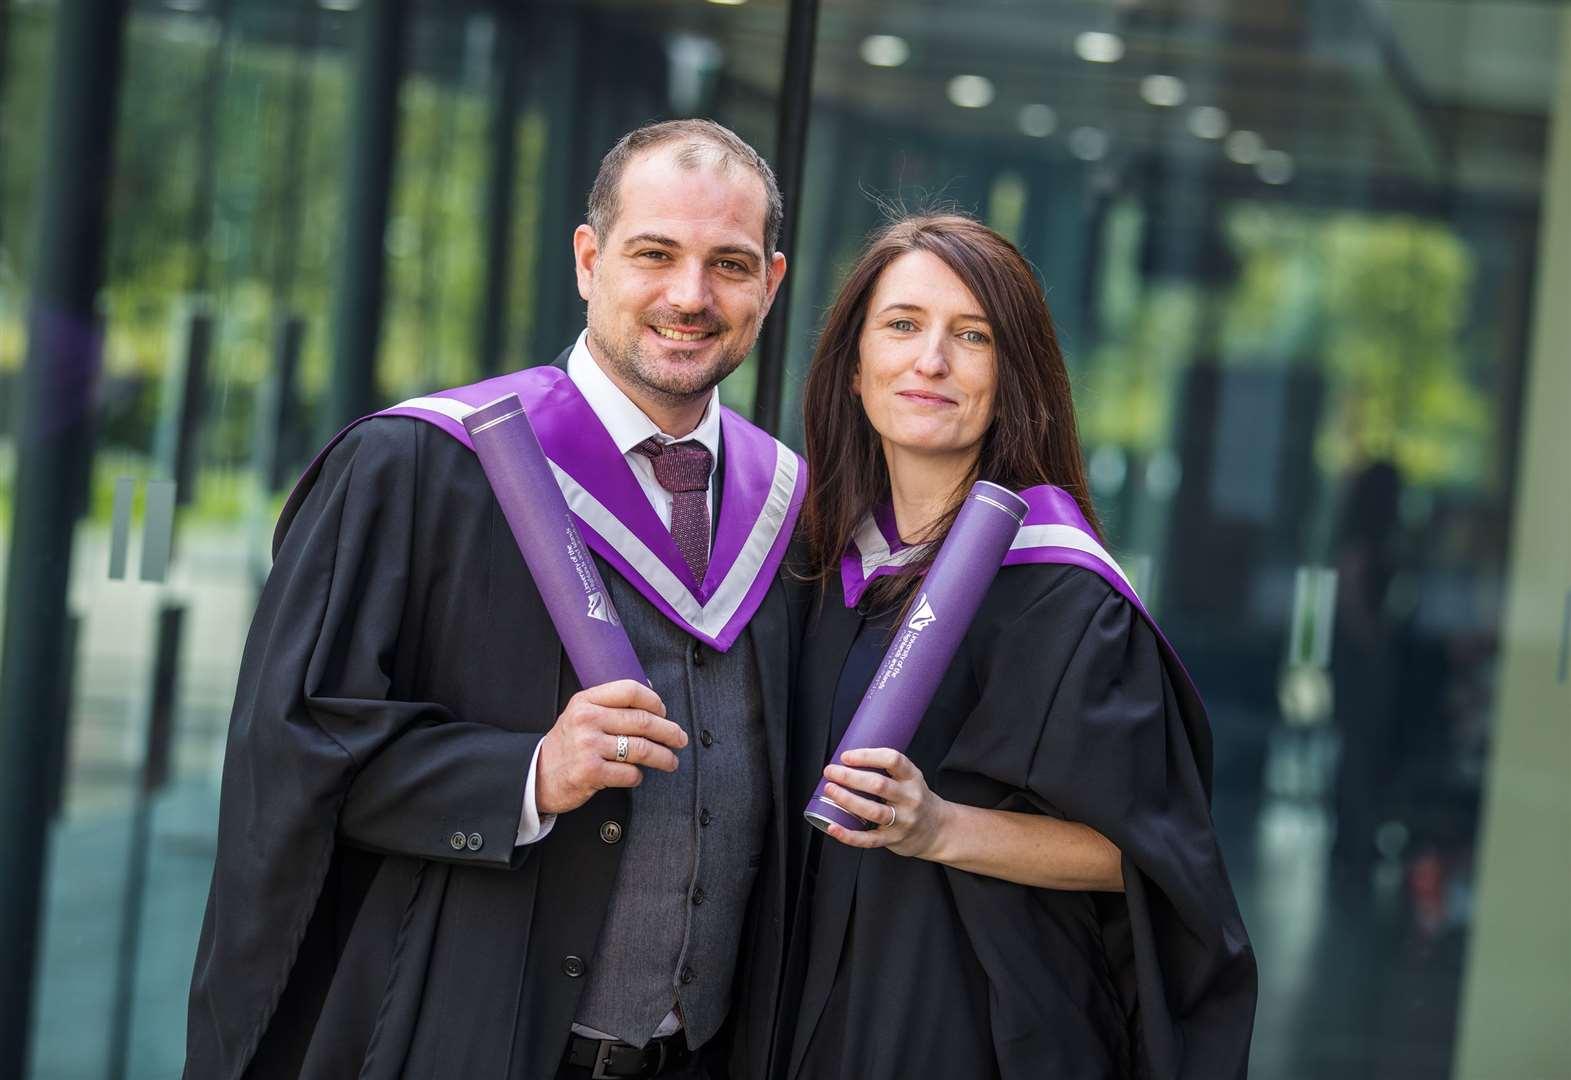 Inverness College UHI graduates reap rewards